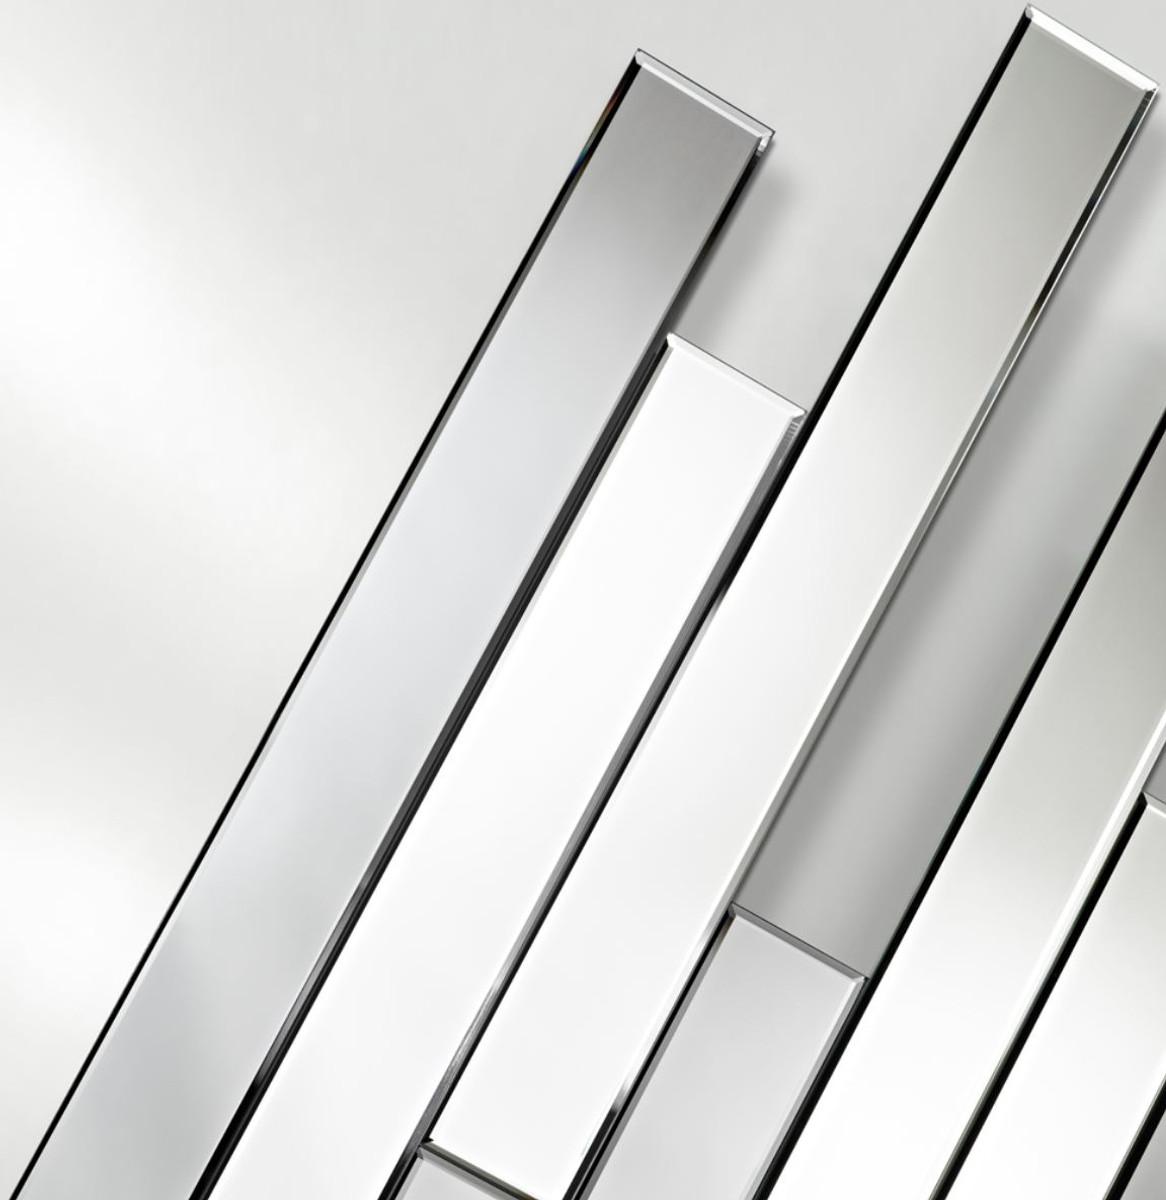 casa padrino designer spiegel wandspiegel 72 x h 133 cm. Black Bedroom Furniture Sets. Home Design Ideas